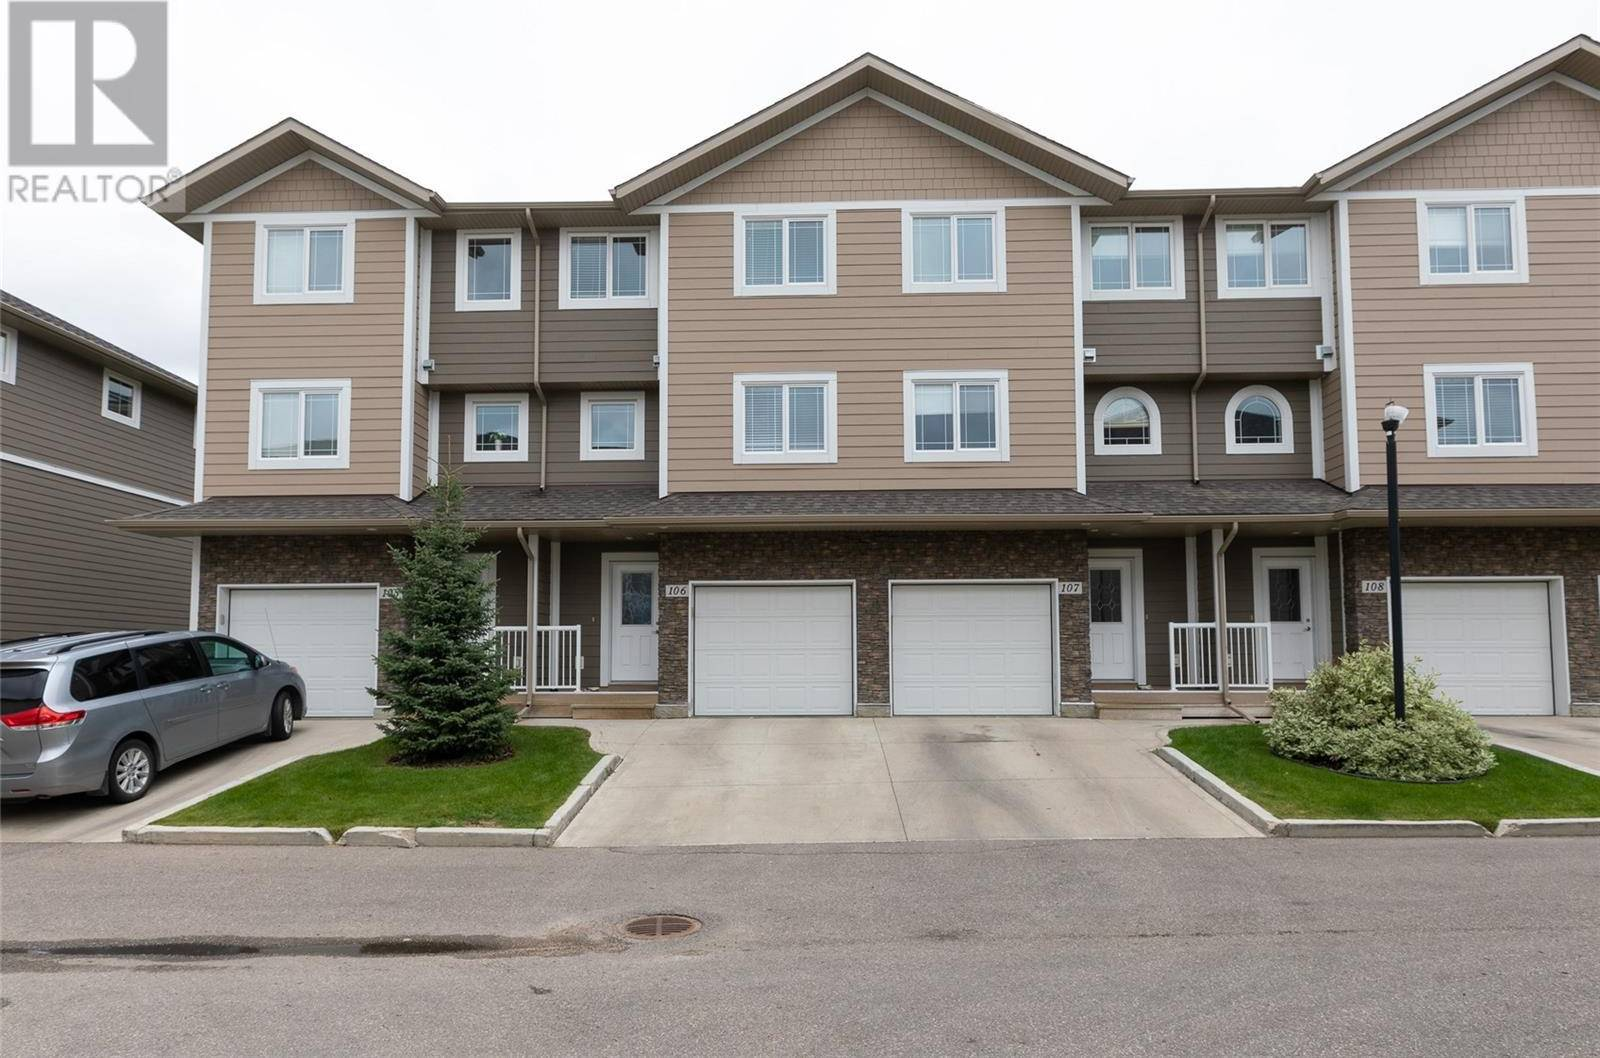 Townhouse for sale at 212 Willis Cres Unit 106 Saskatoon Saskatchewan - MLS: SK787823